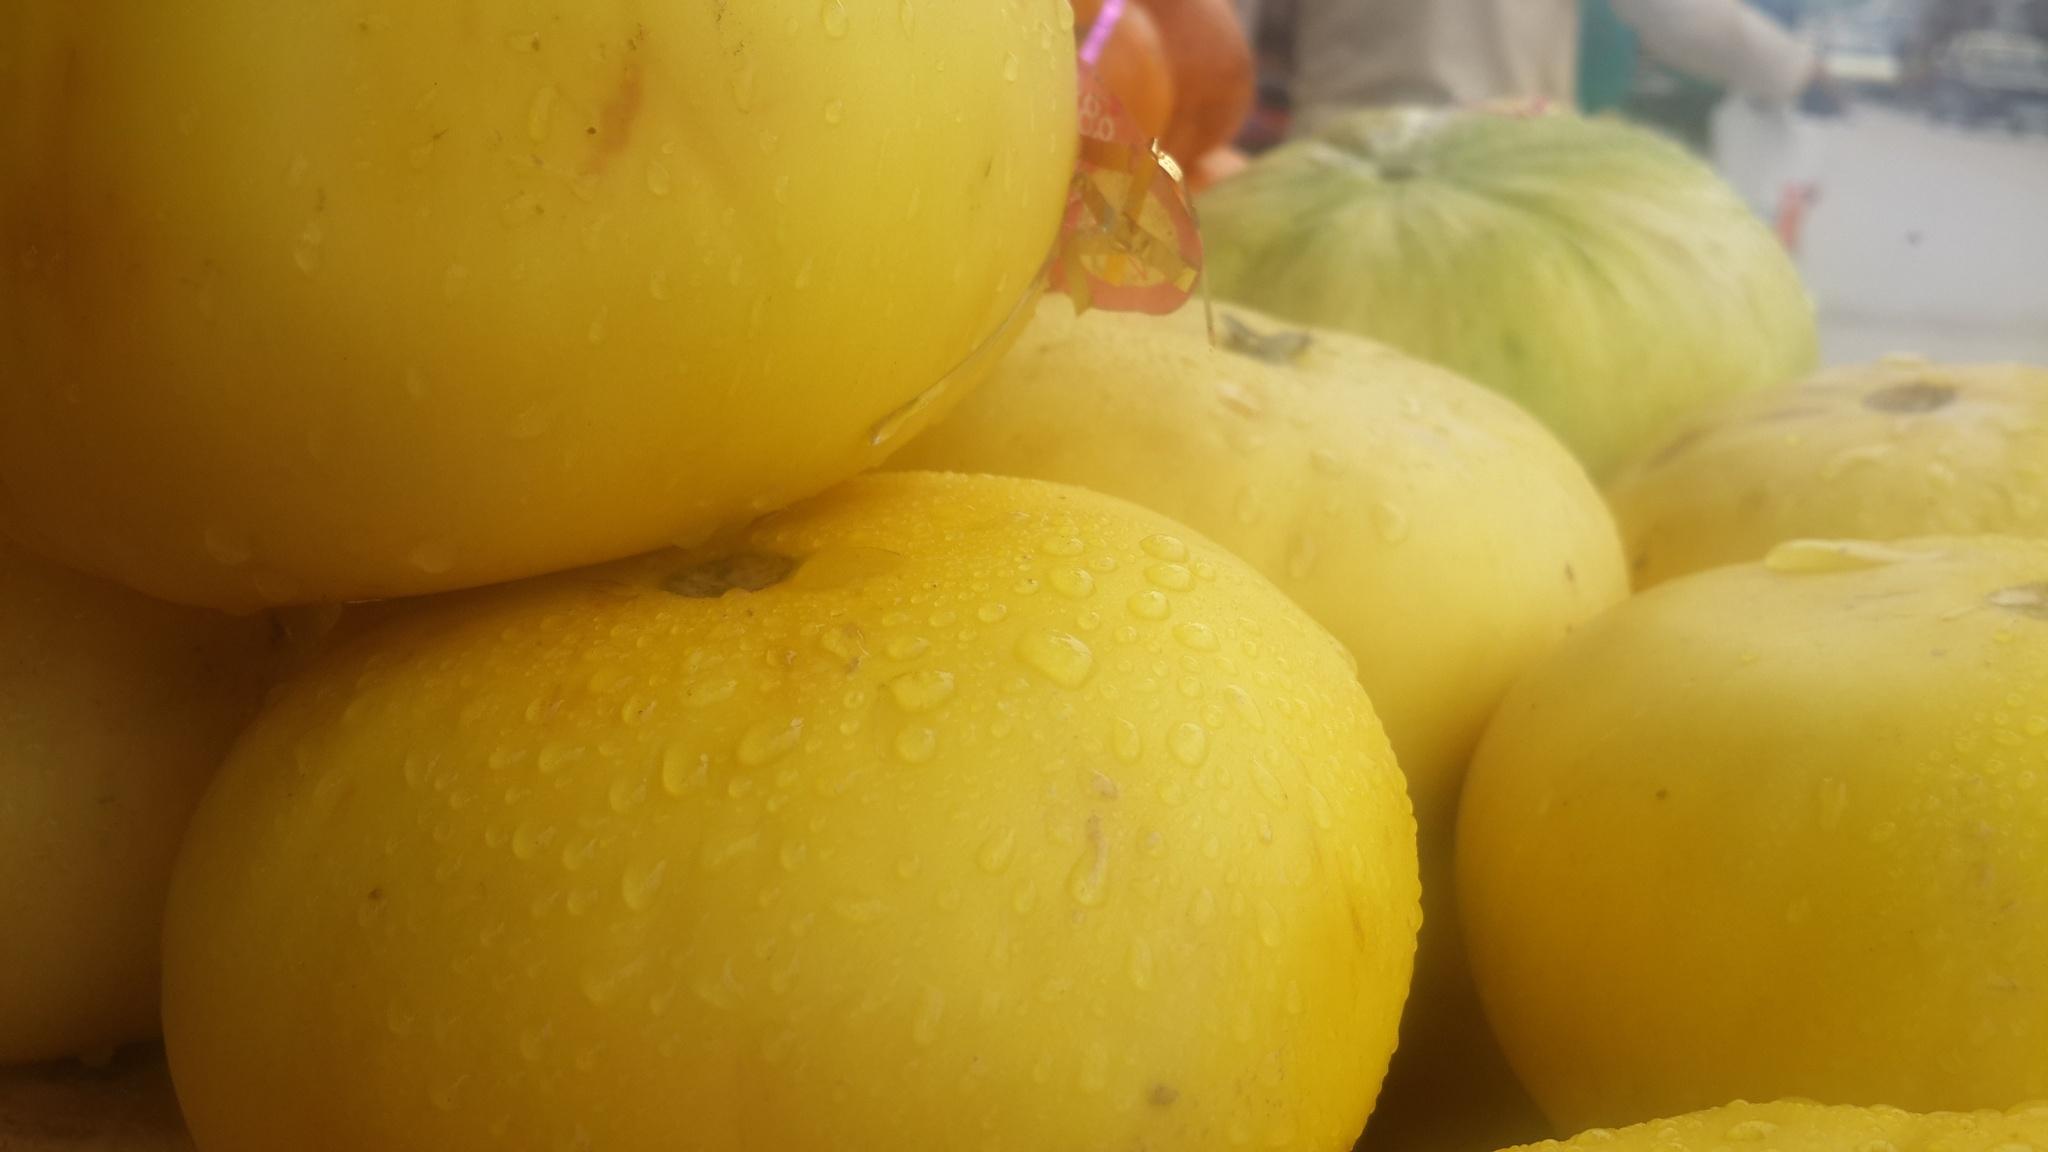 Melon by jamil hussain